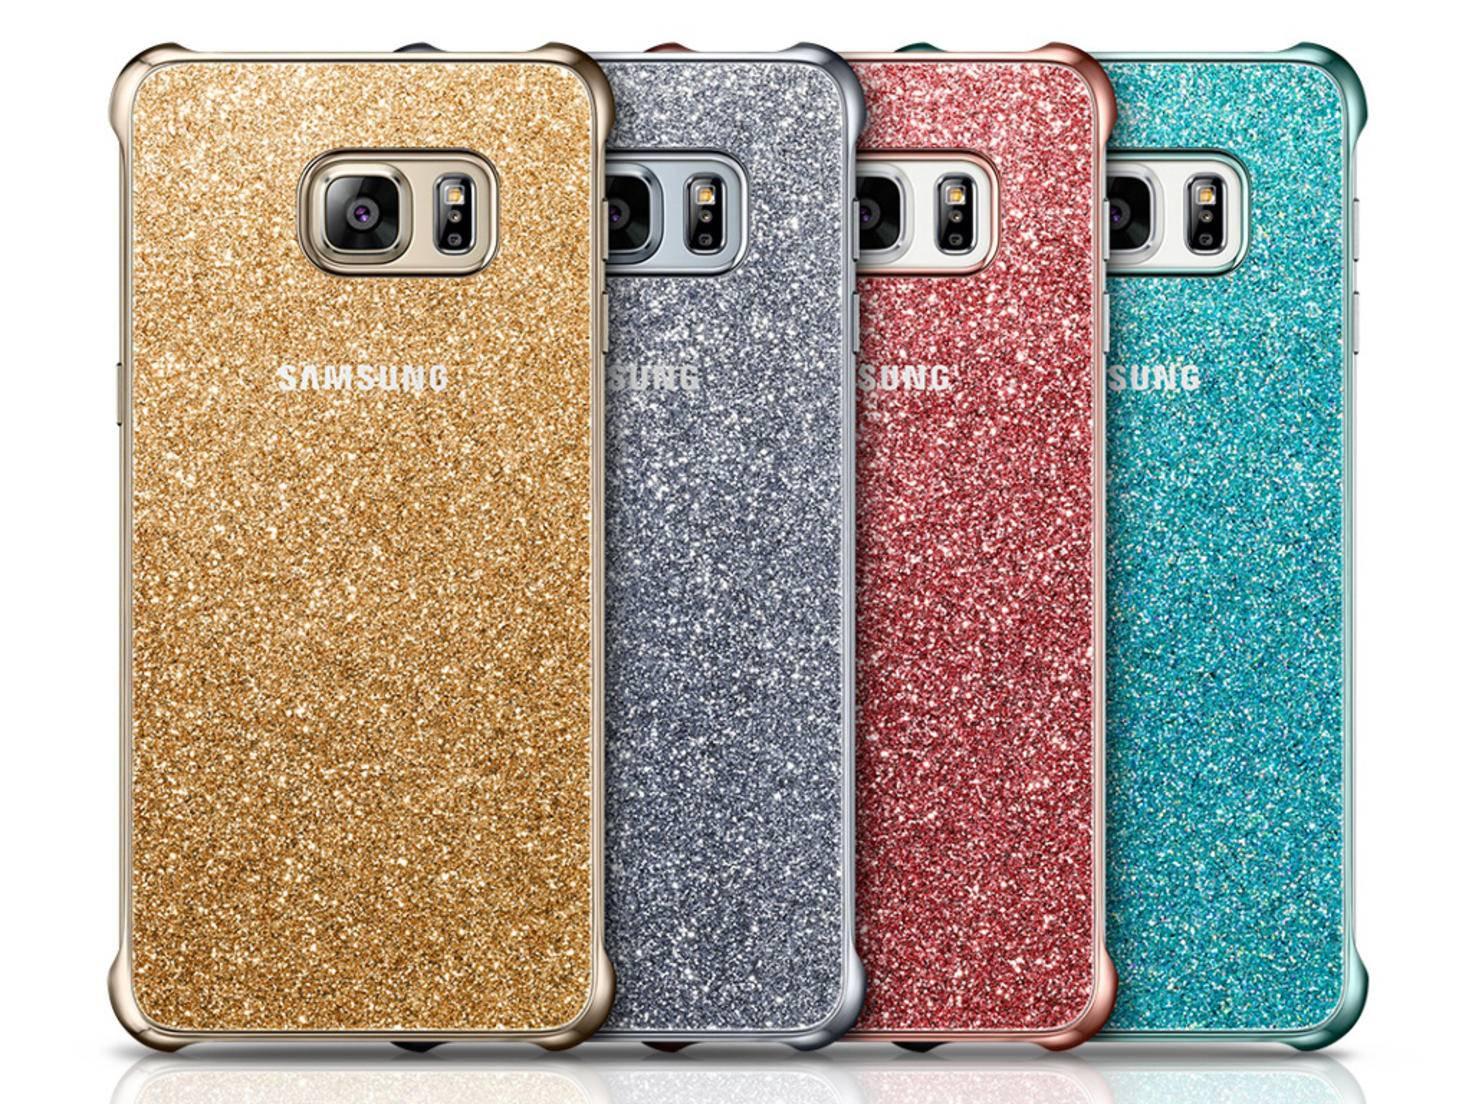 GalaxyS6EdgePlus_Glitter